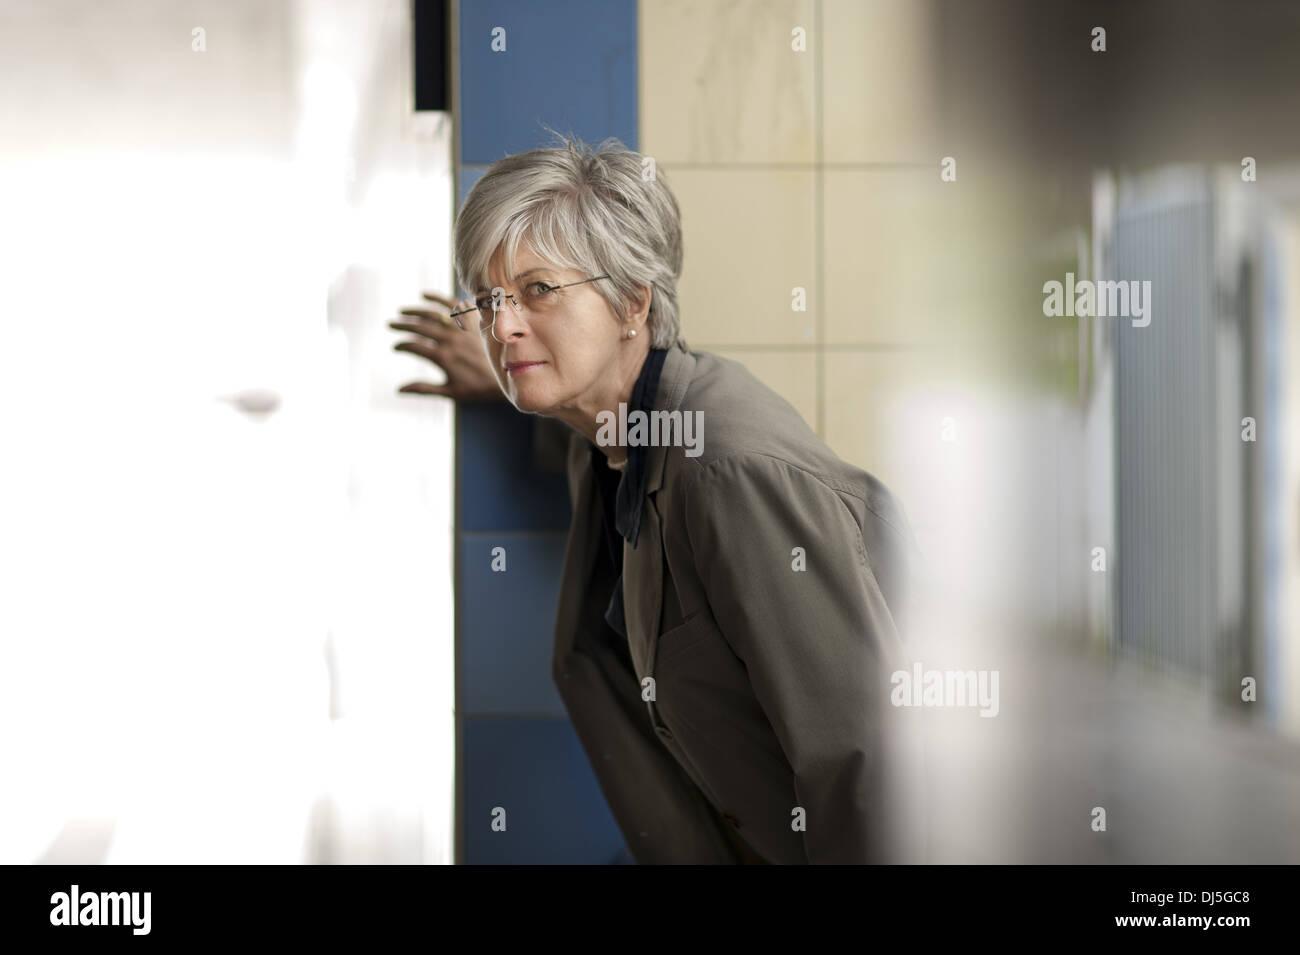 cautious view - Stock Image